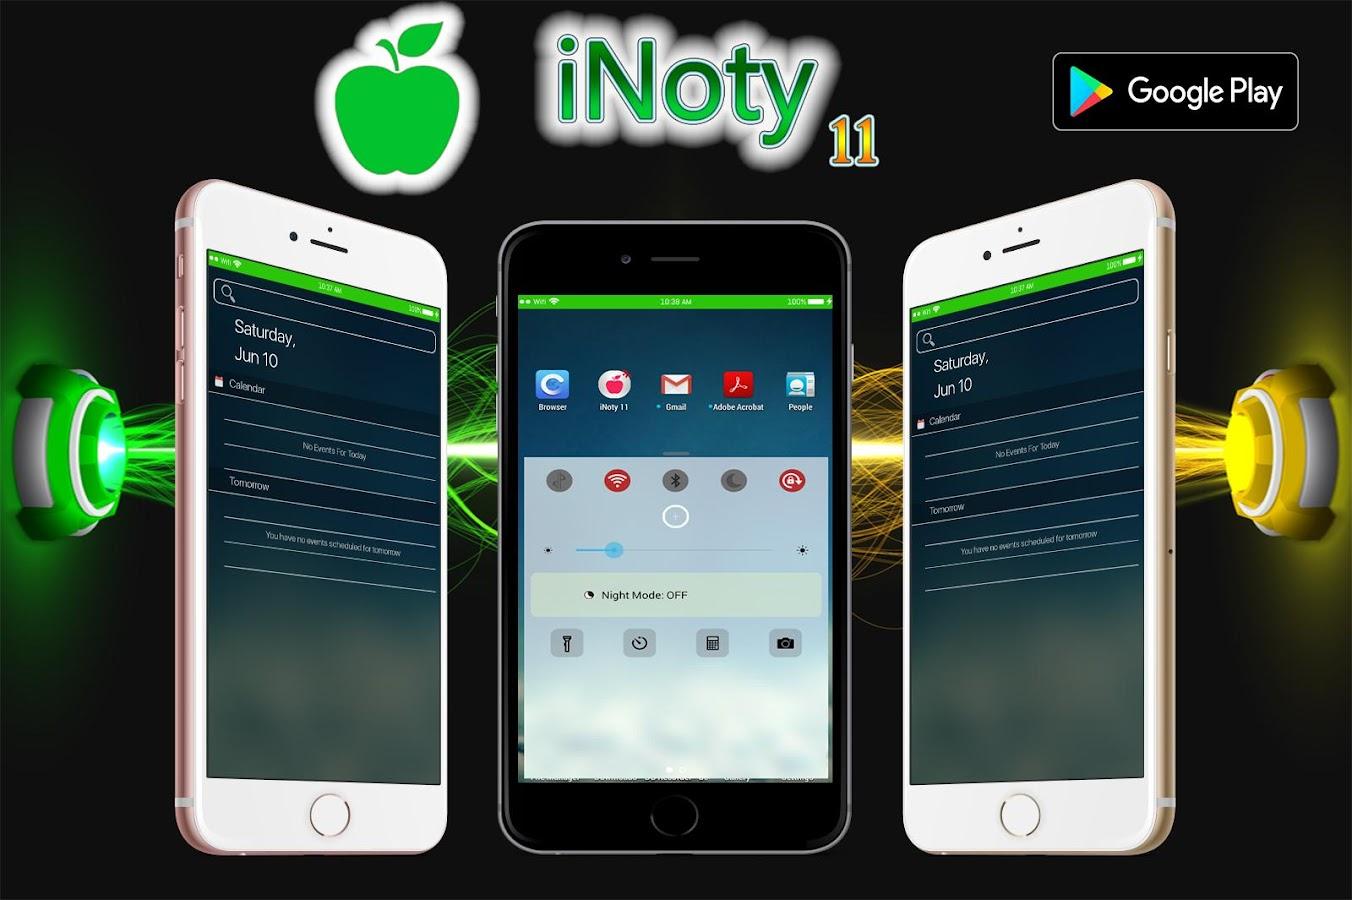 Inoty Ios 13 Pro Apk